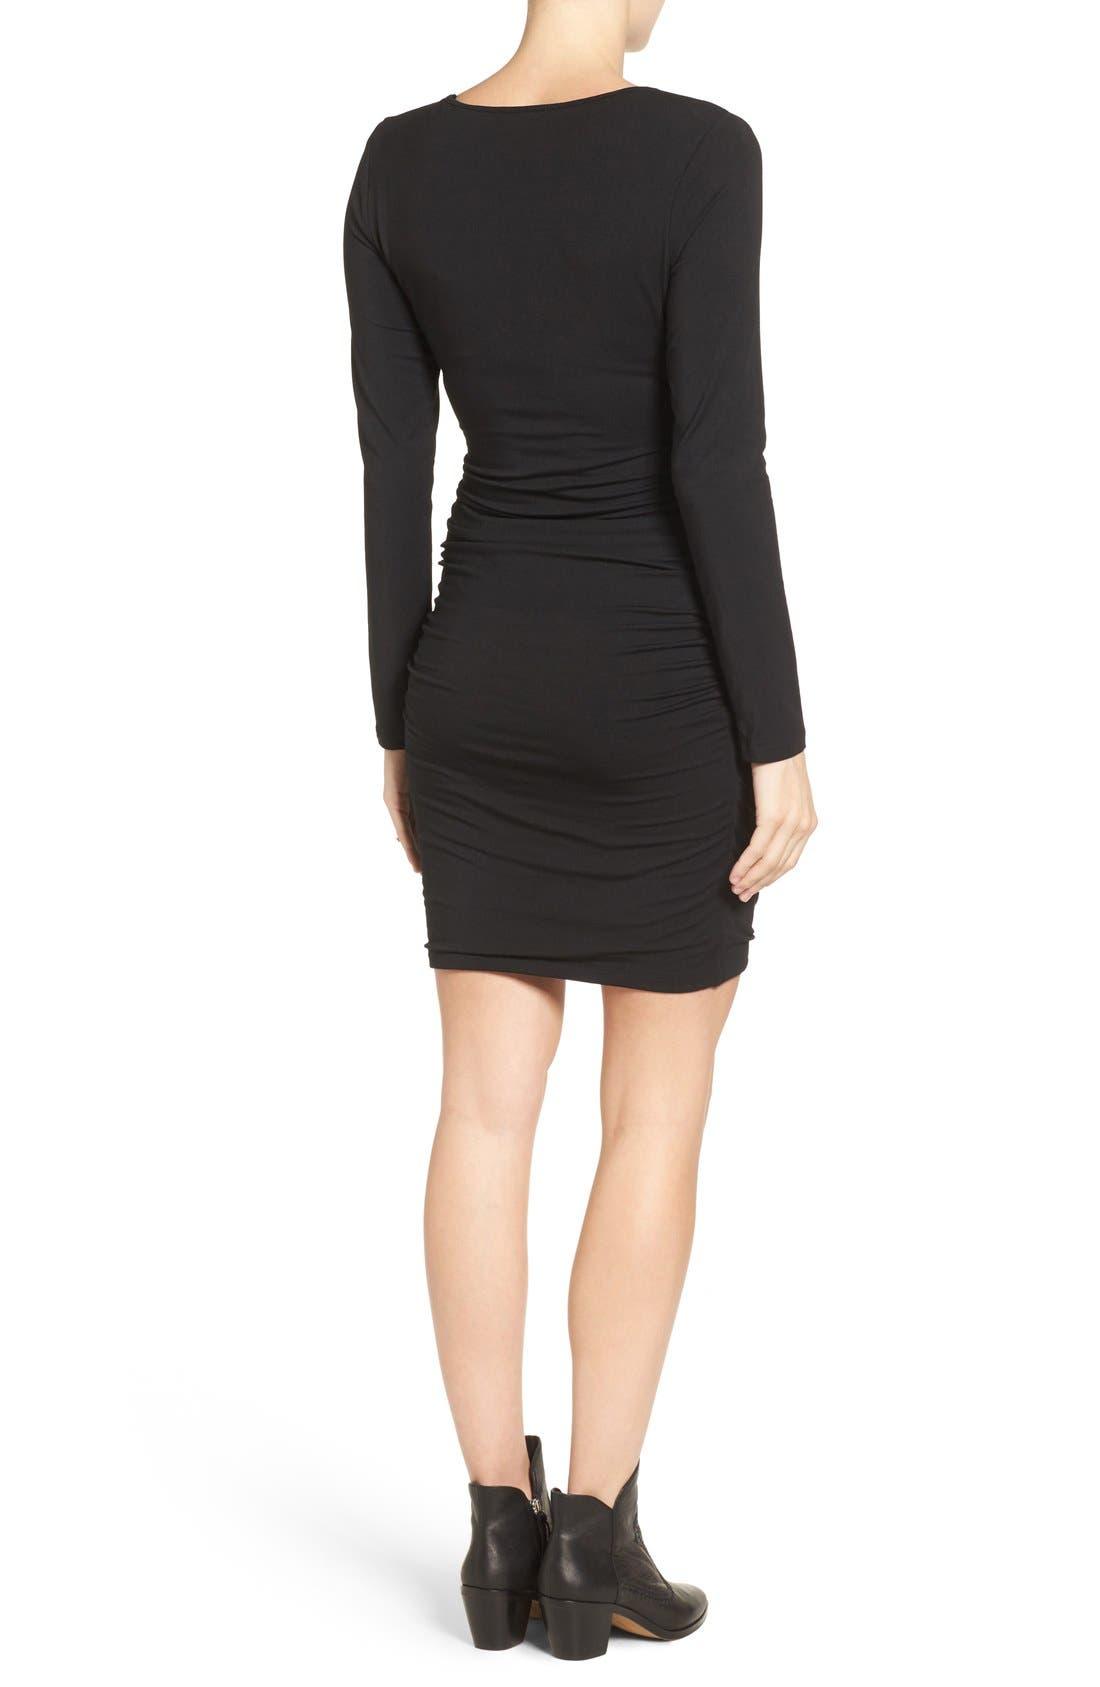 TART MATERNITY Tart 'Peaches' Maternity Body-Con Dress, Main, color, BLACK